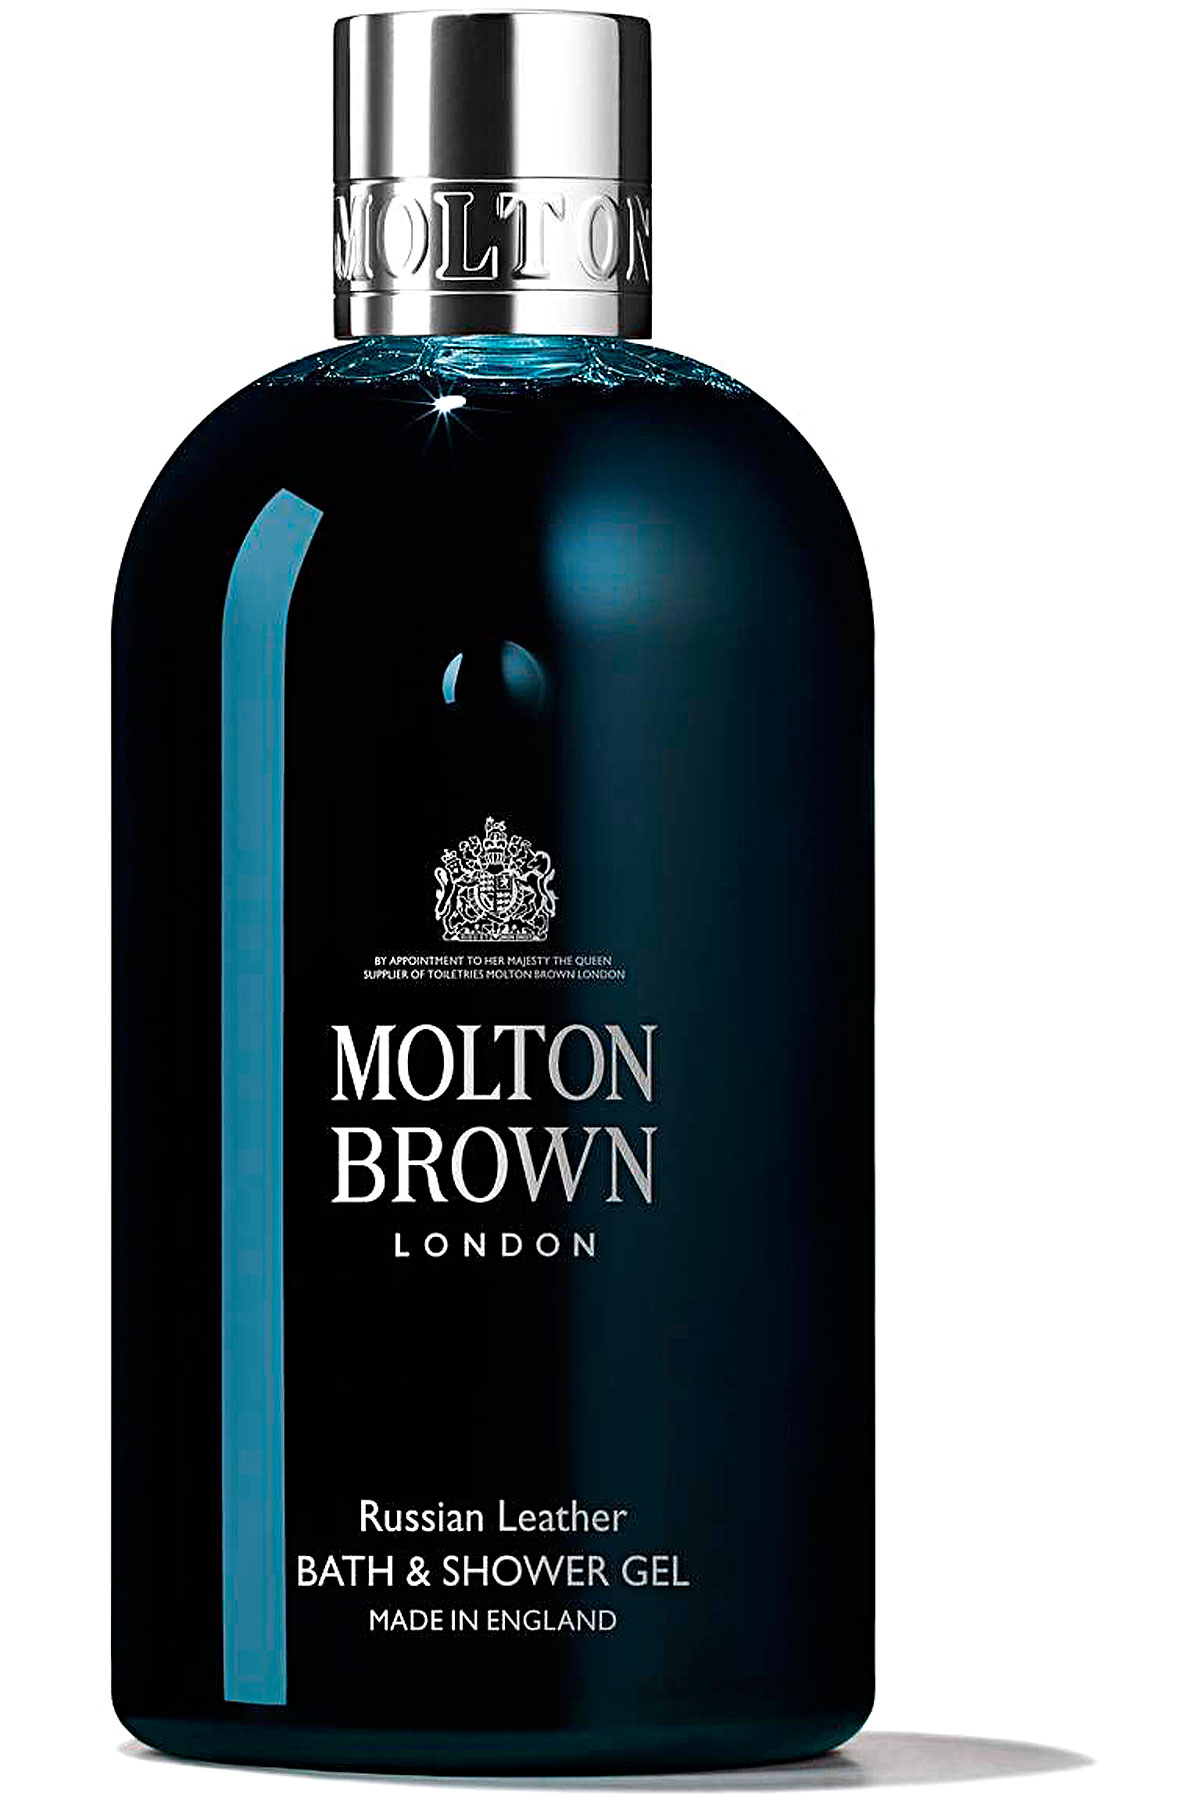 Molton Brown Beauty for Men, Russian Leather - Bath & Shower Gel - 300 Ml, 2019, 300 ml